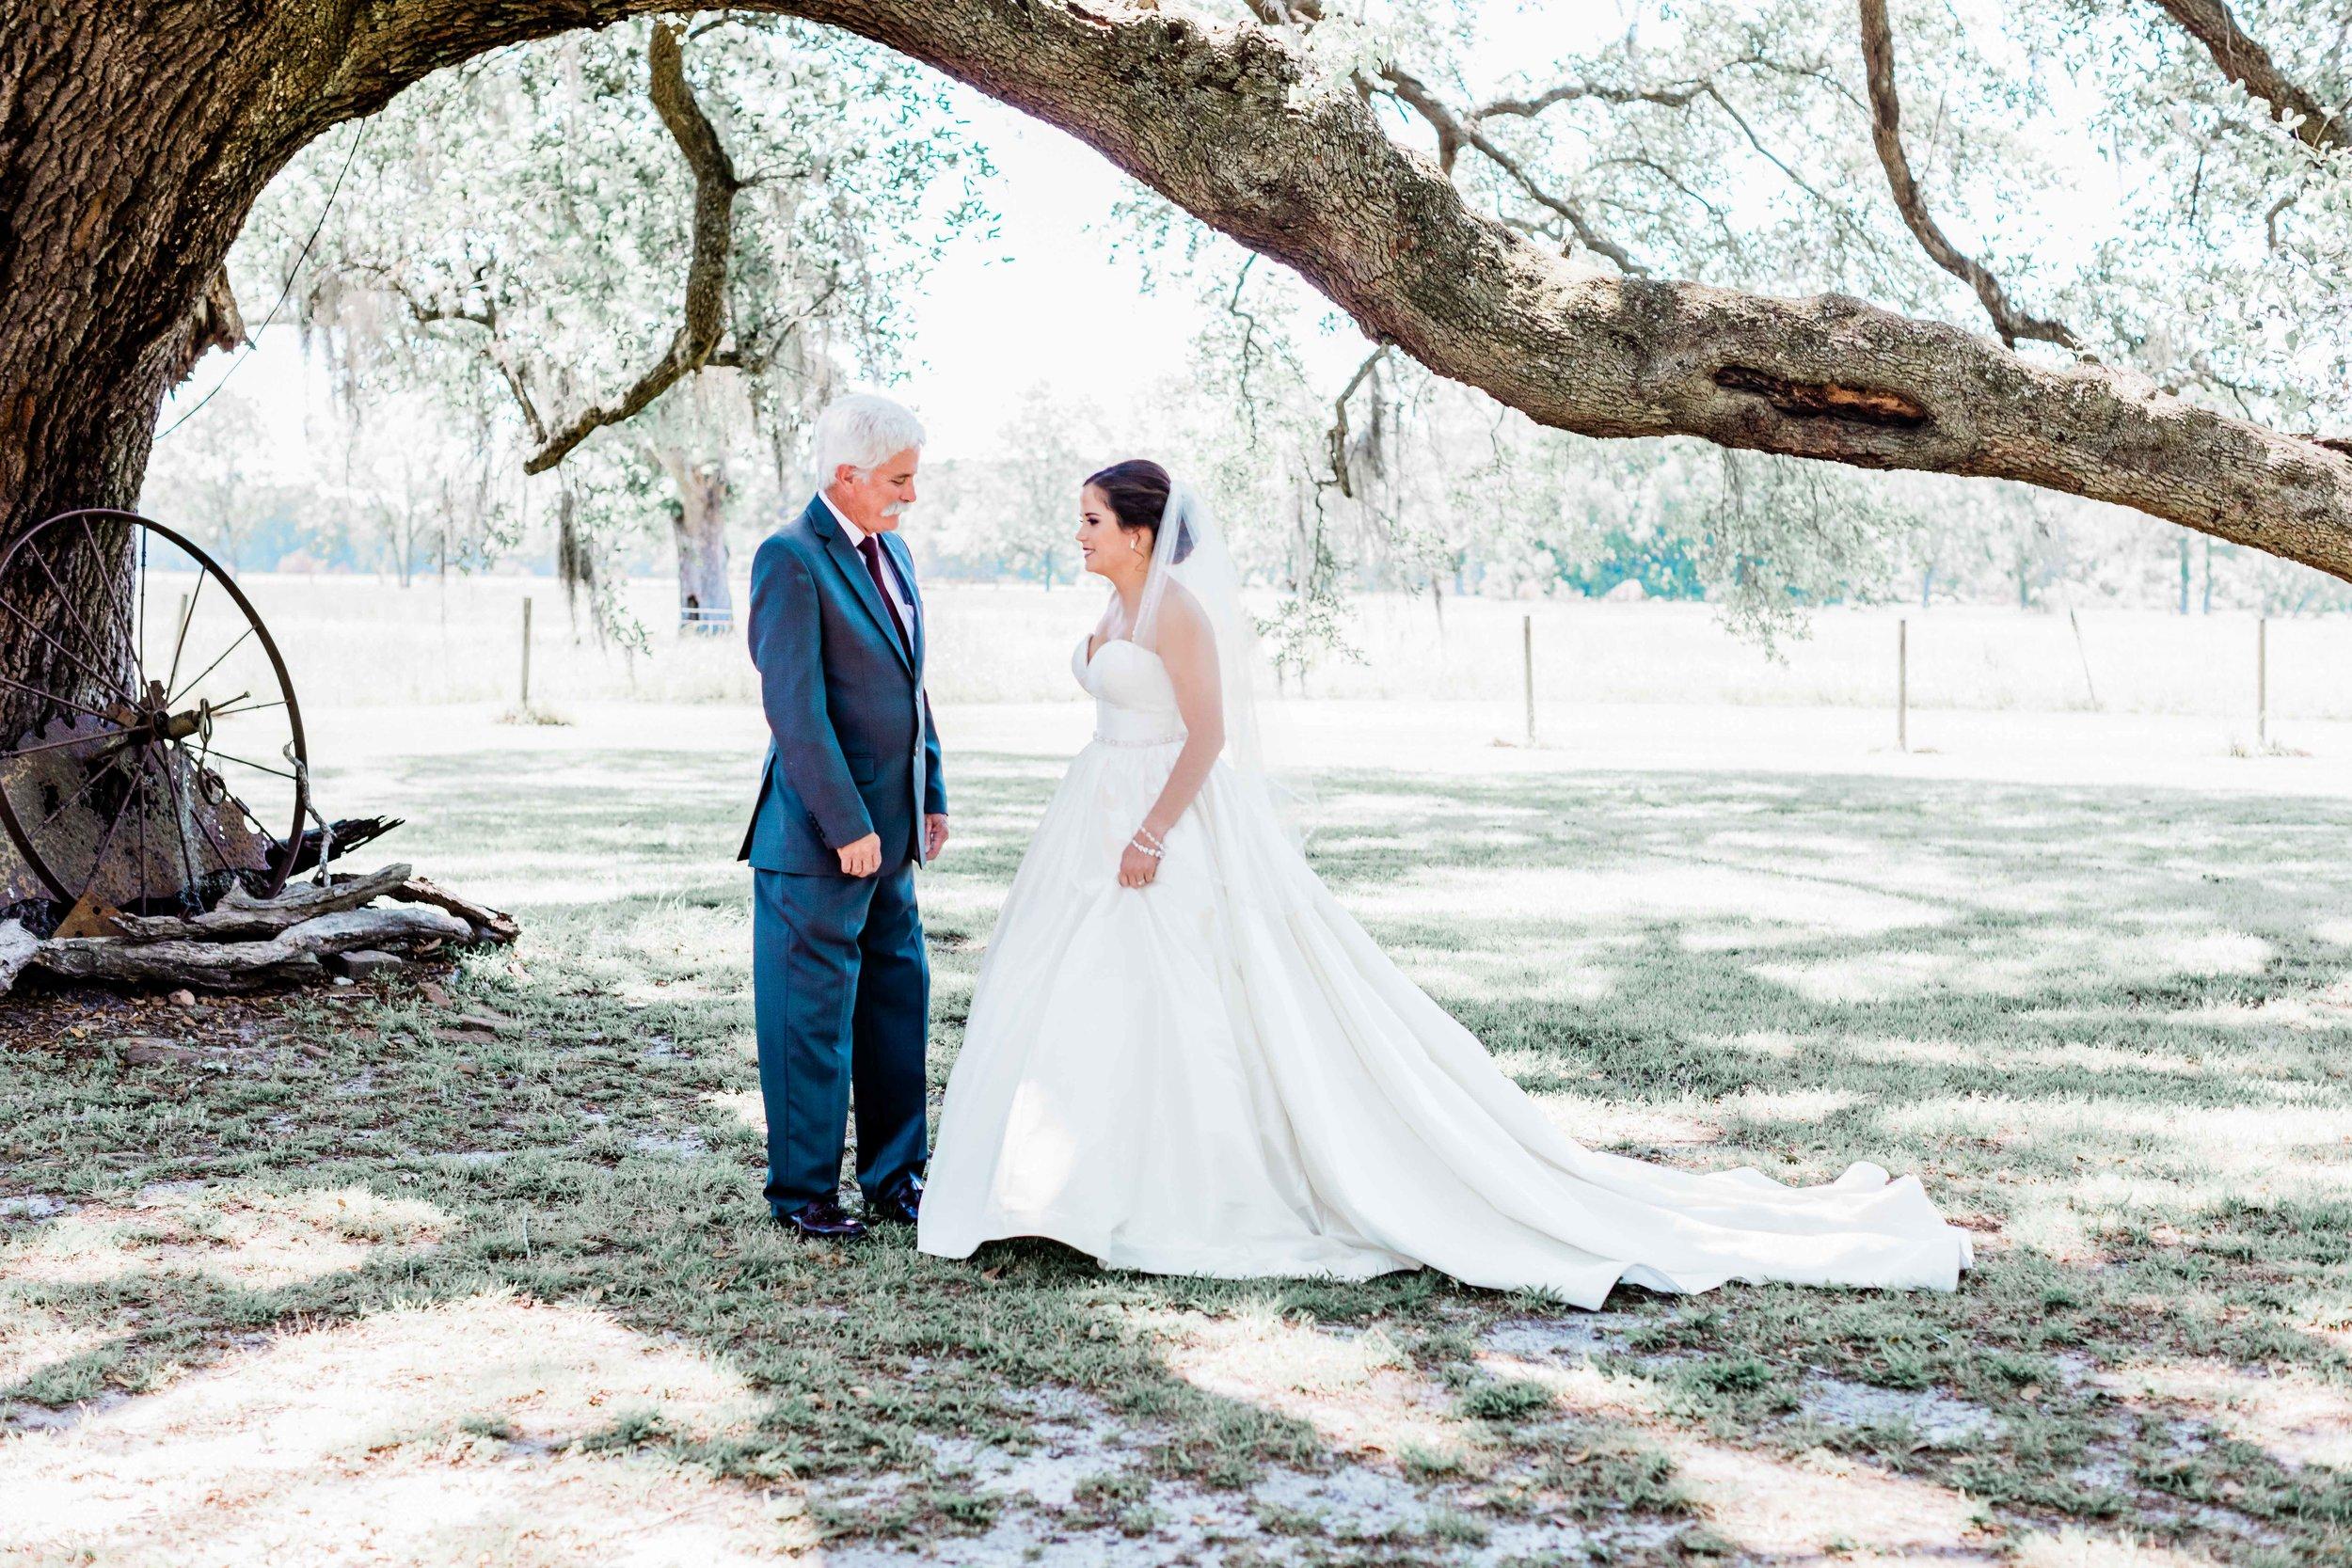 20190427-Southern Lens Photography- Savannah Wedding Photographer-Screven and Caroline-201928.jpg